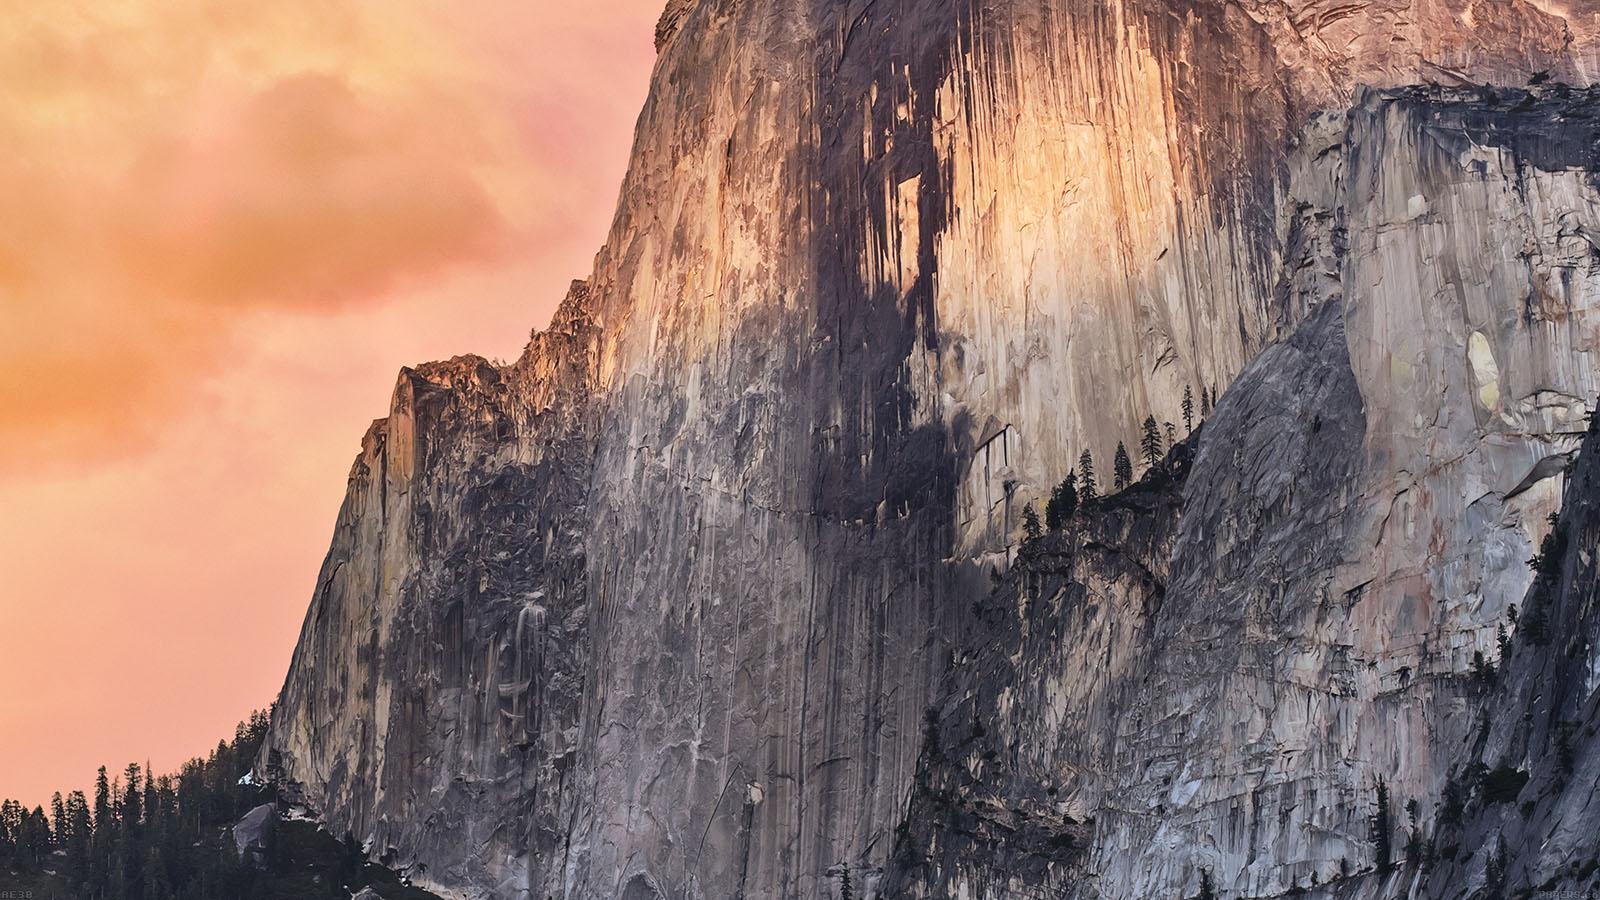 Ae30 Yosemite Mac Wallpaper Os X Wallpaper